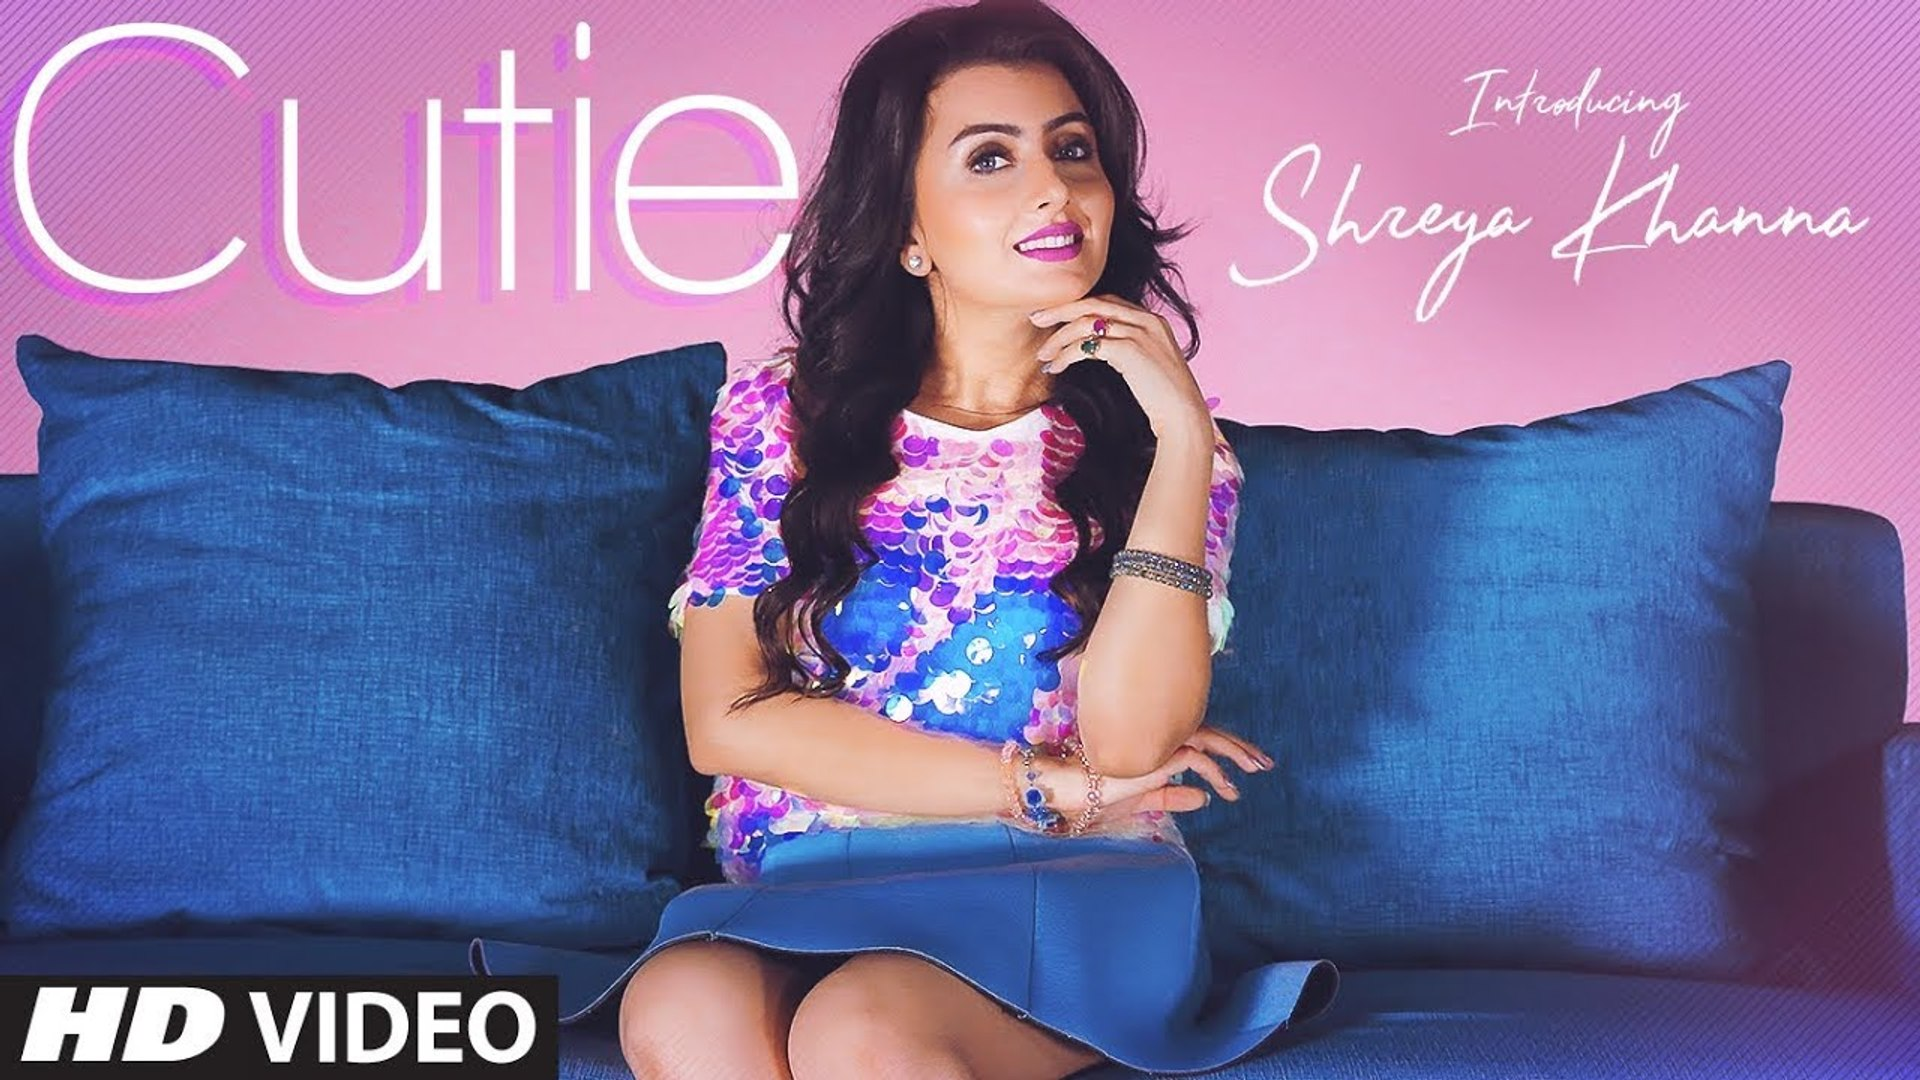 Shreya Khanna: Cutie Song | Intense | Robby Singh | Latest Punjabi Songs 2018